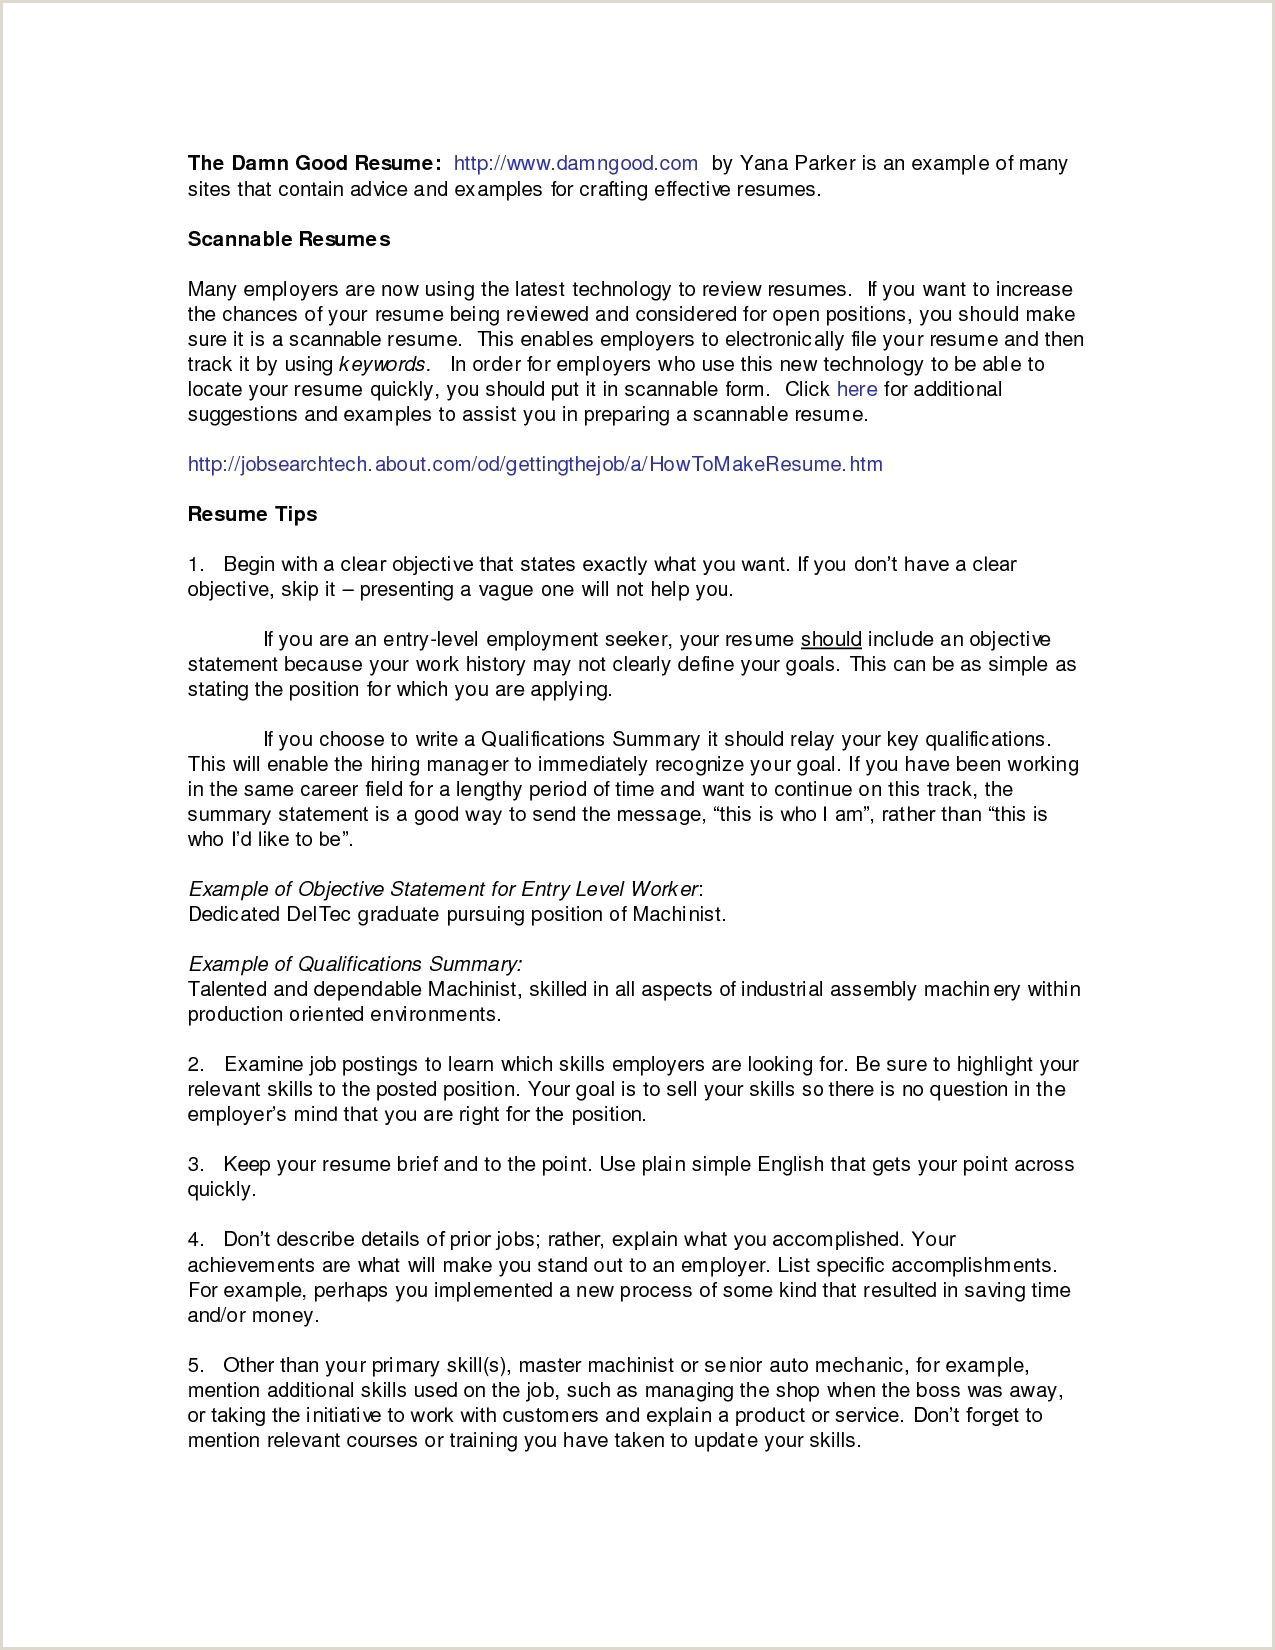 Key Account Manager Job Description Example Rose Glen north Dakota ⁓ Try these Key Skills Cv Account Manager